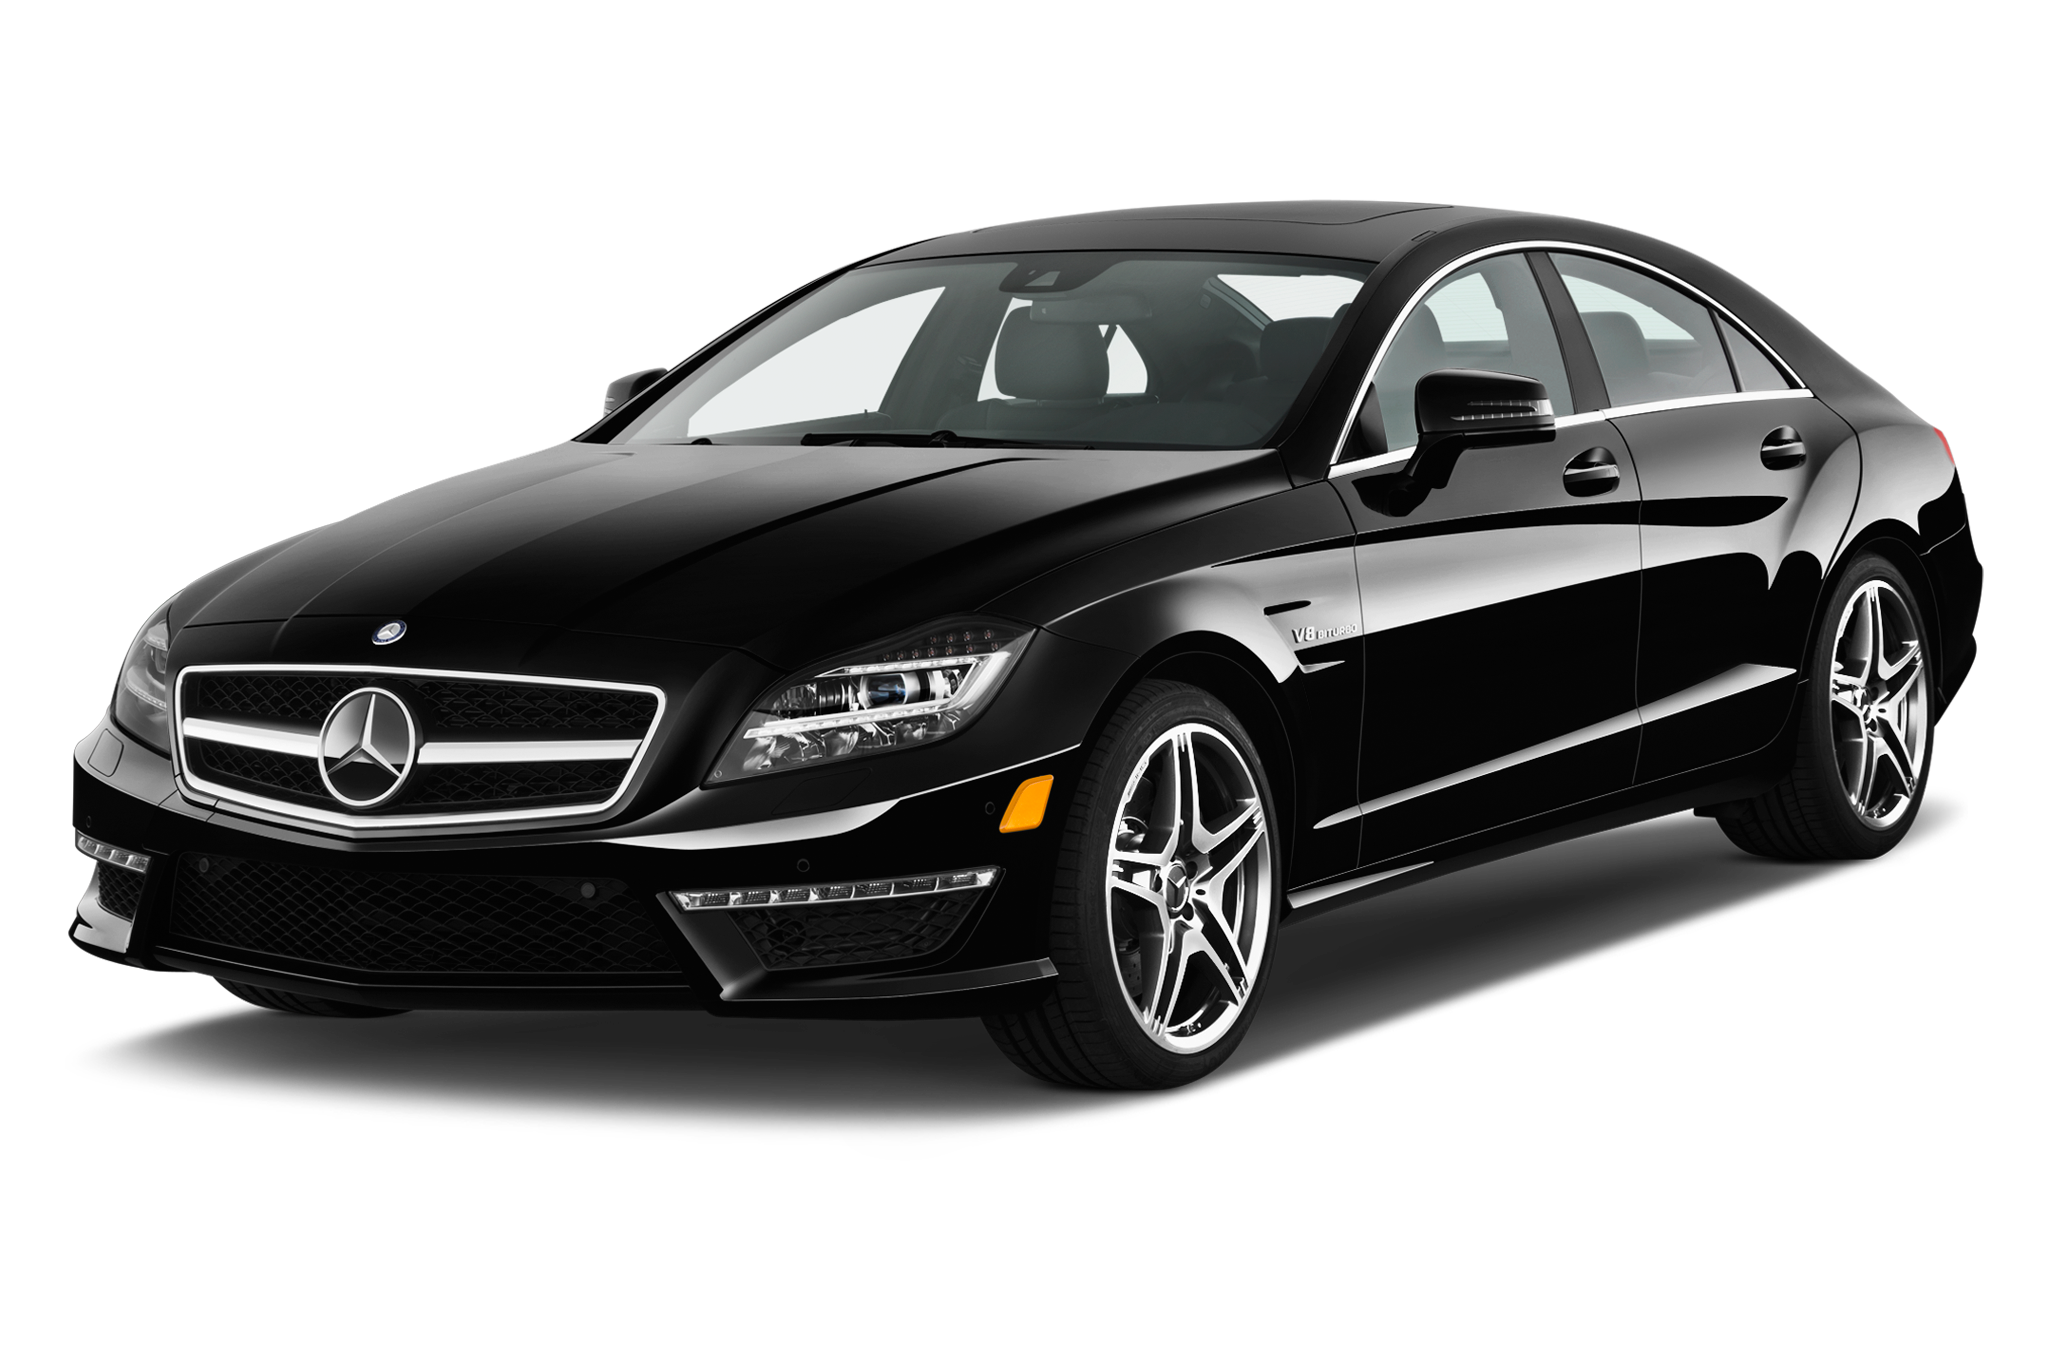 Mercedes Benz CLS CL CLS550 2013 - International Price & Overview on mercedes-benz 2014 e-class convertible price, mercedes-benz cls 550 2015 price, 2013 mercedes cls coupe price, 2013 mercedes s550 price, mercedes-benz s-class 2013 price,